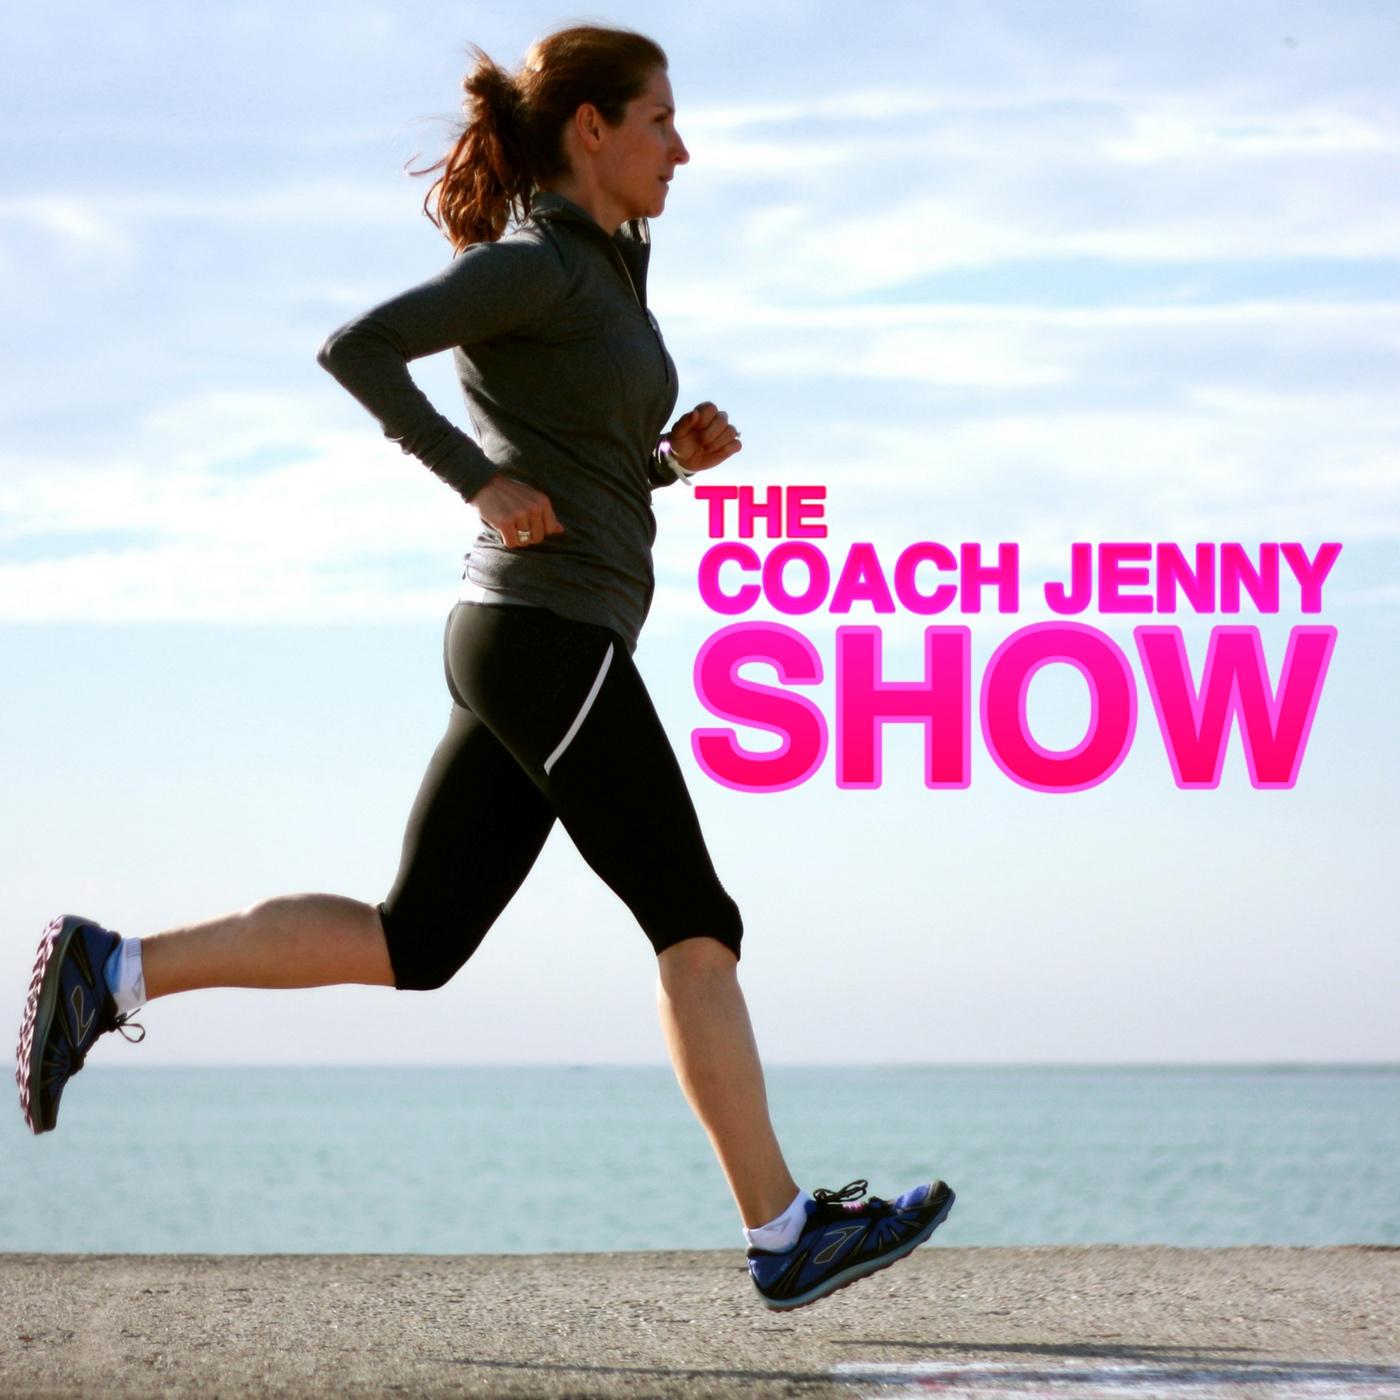 The Coach Jenny Show show art